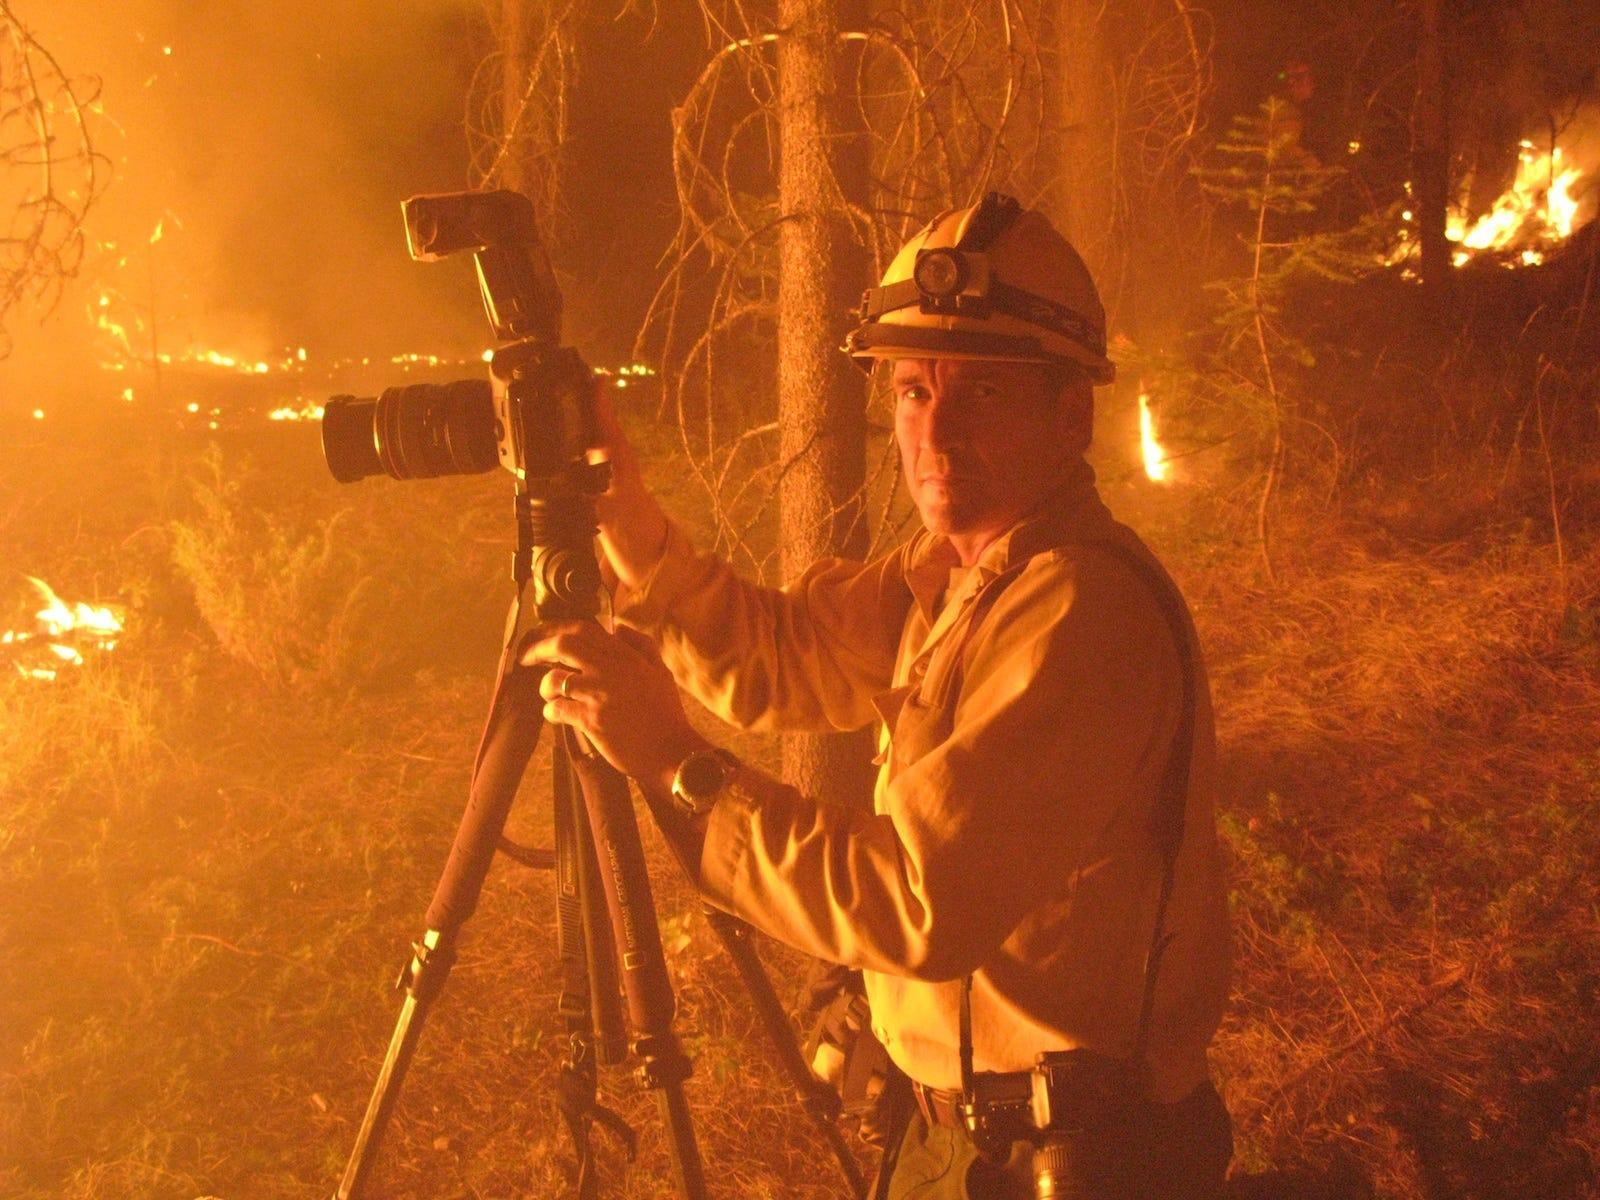 Nat Geo Photographer Mark Thiessen